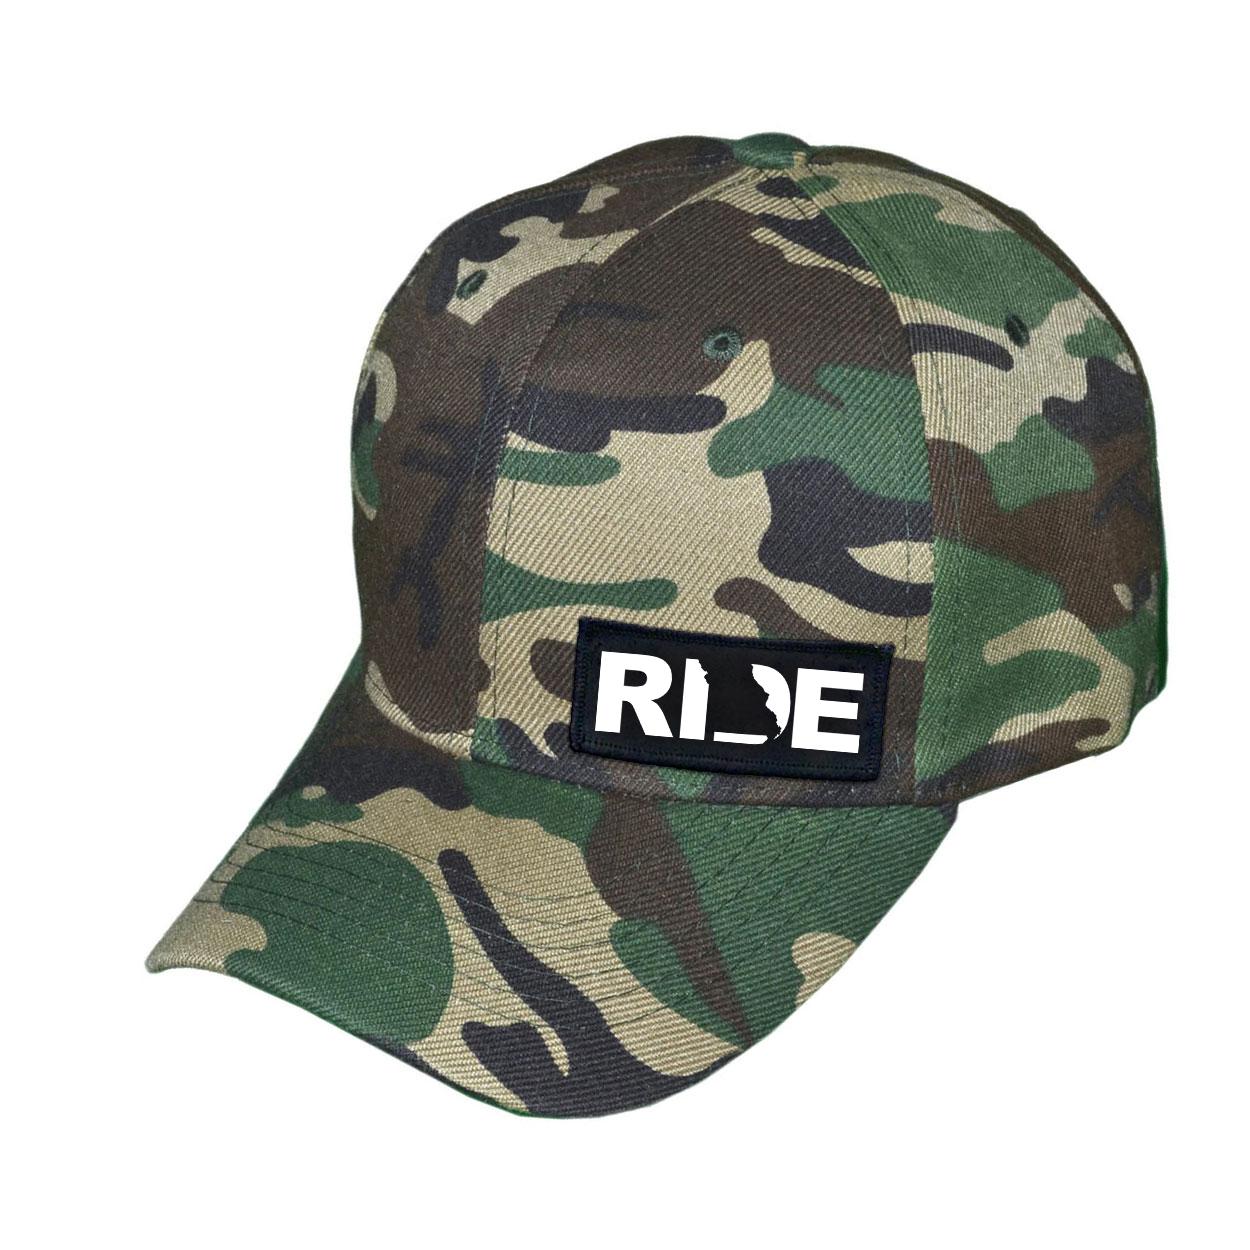 Ride Missouri Night Out Woven Patch Hat Camo (White Logo)